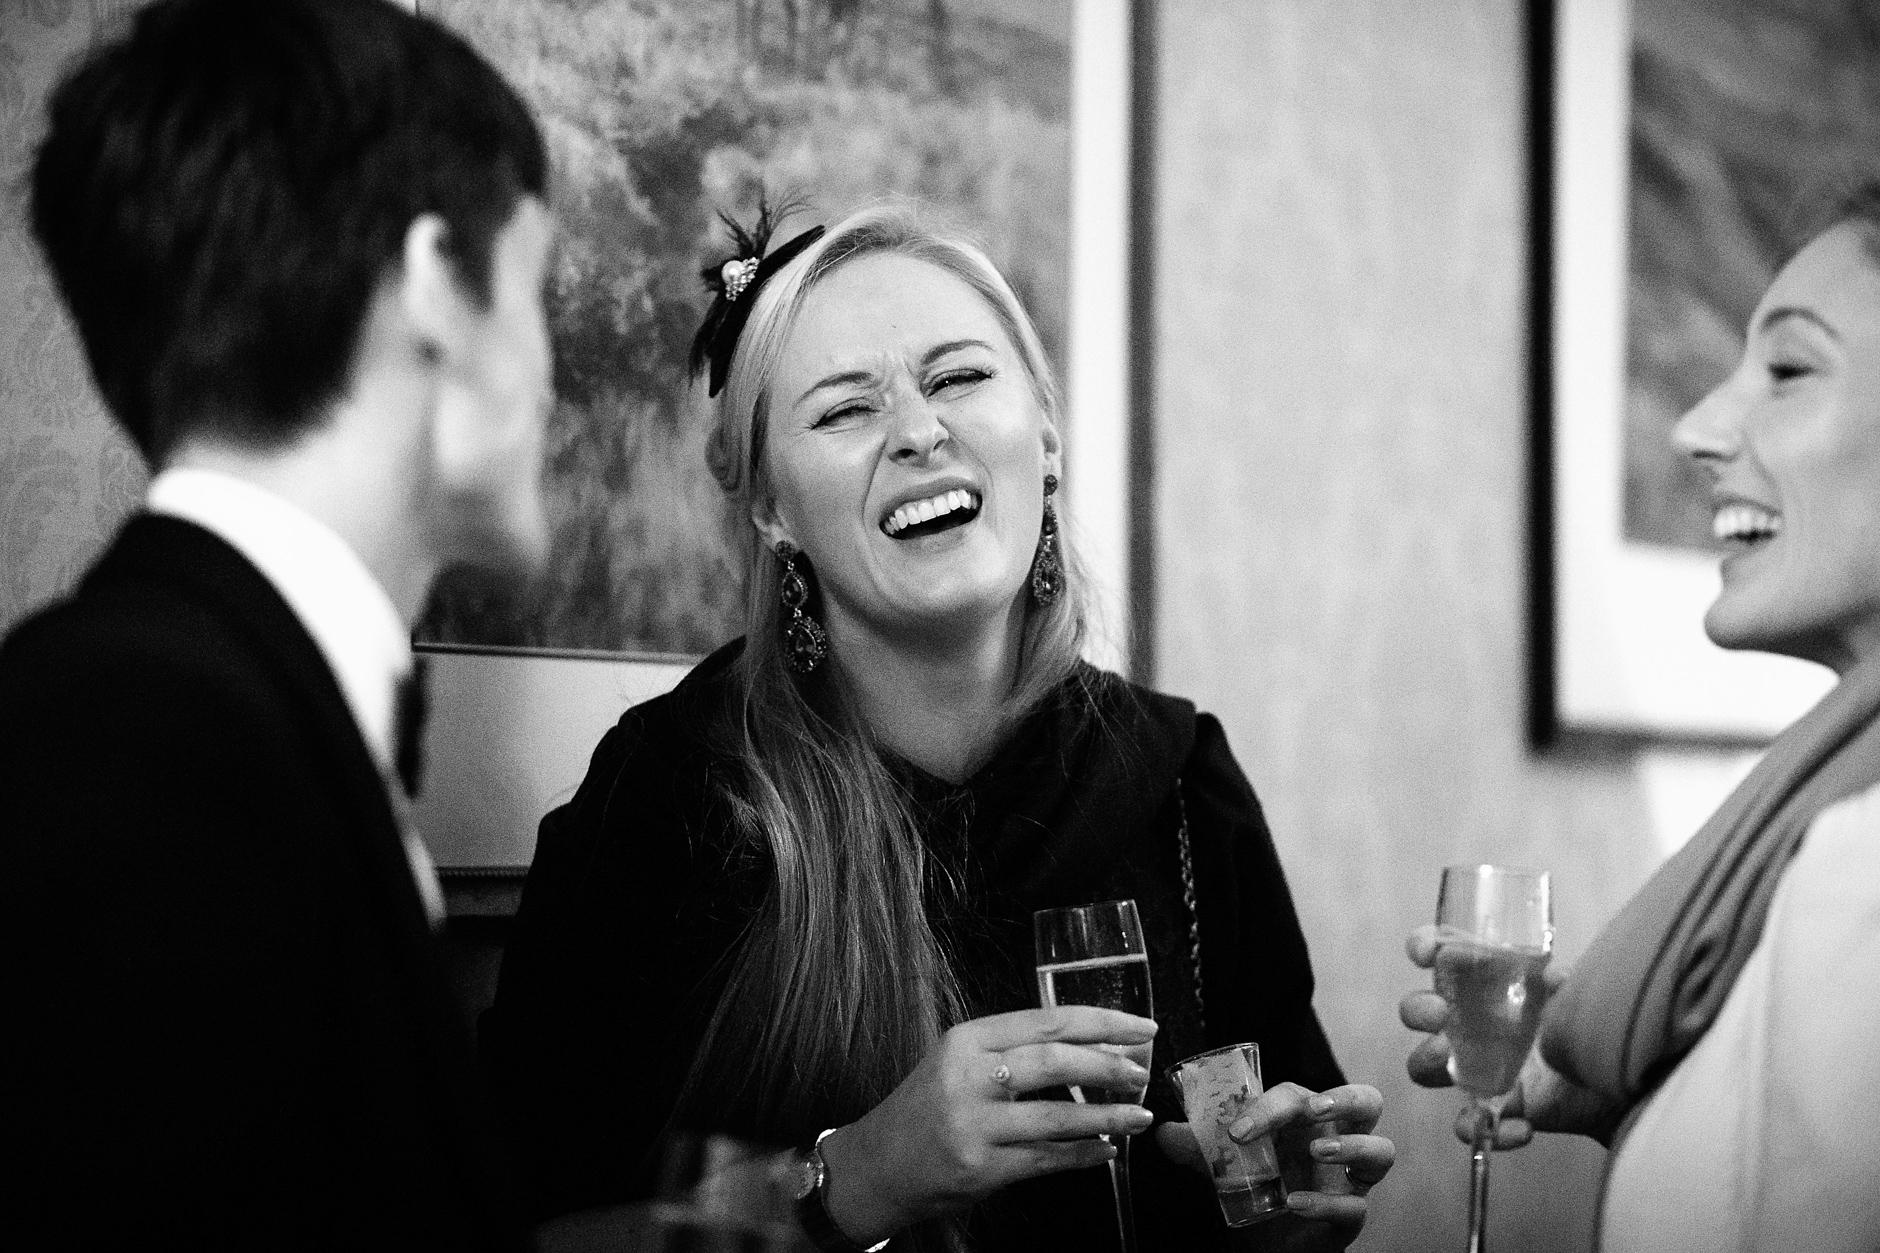 Glentruim-Wedding-Nikki-Leadbetter-Photography-238.jpg